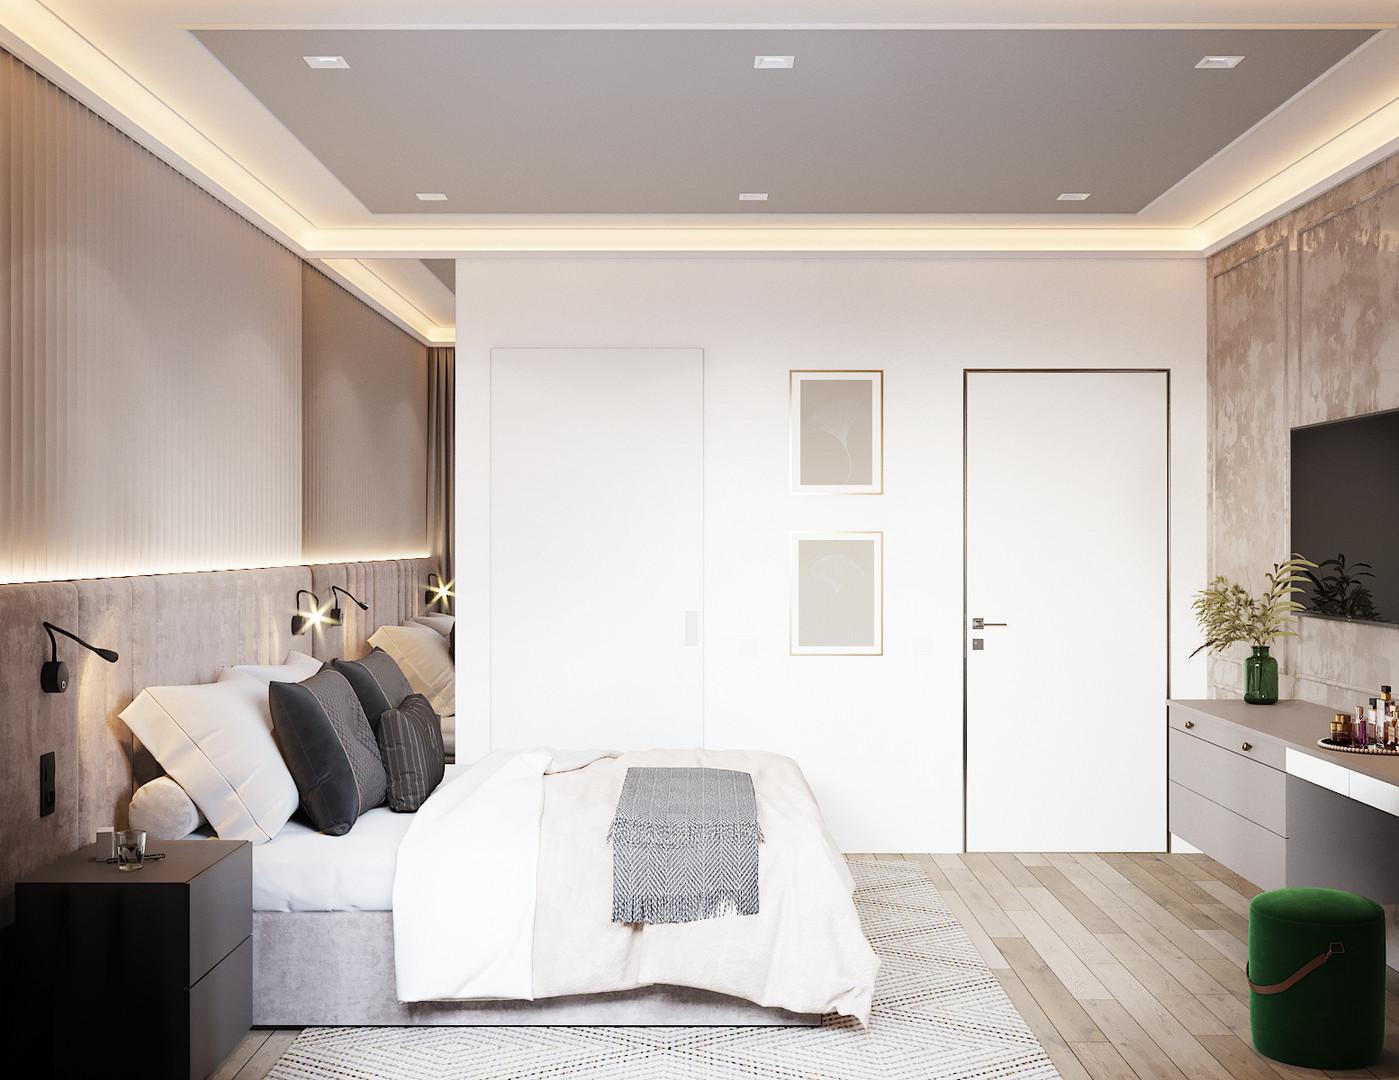 спальня светлая